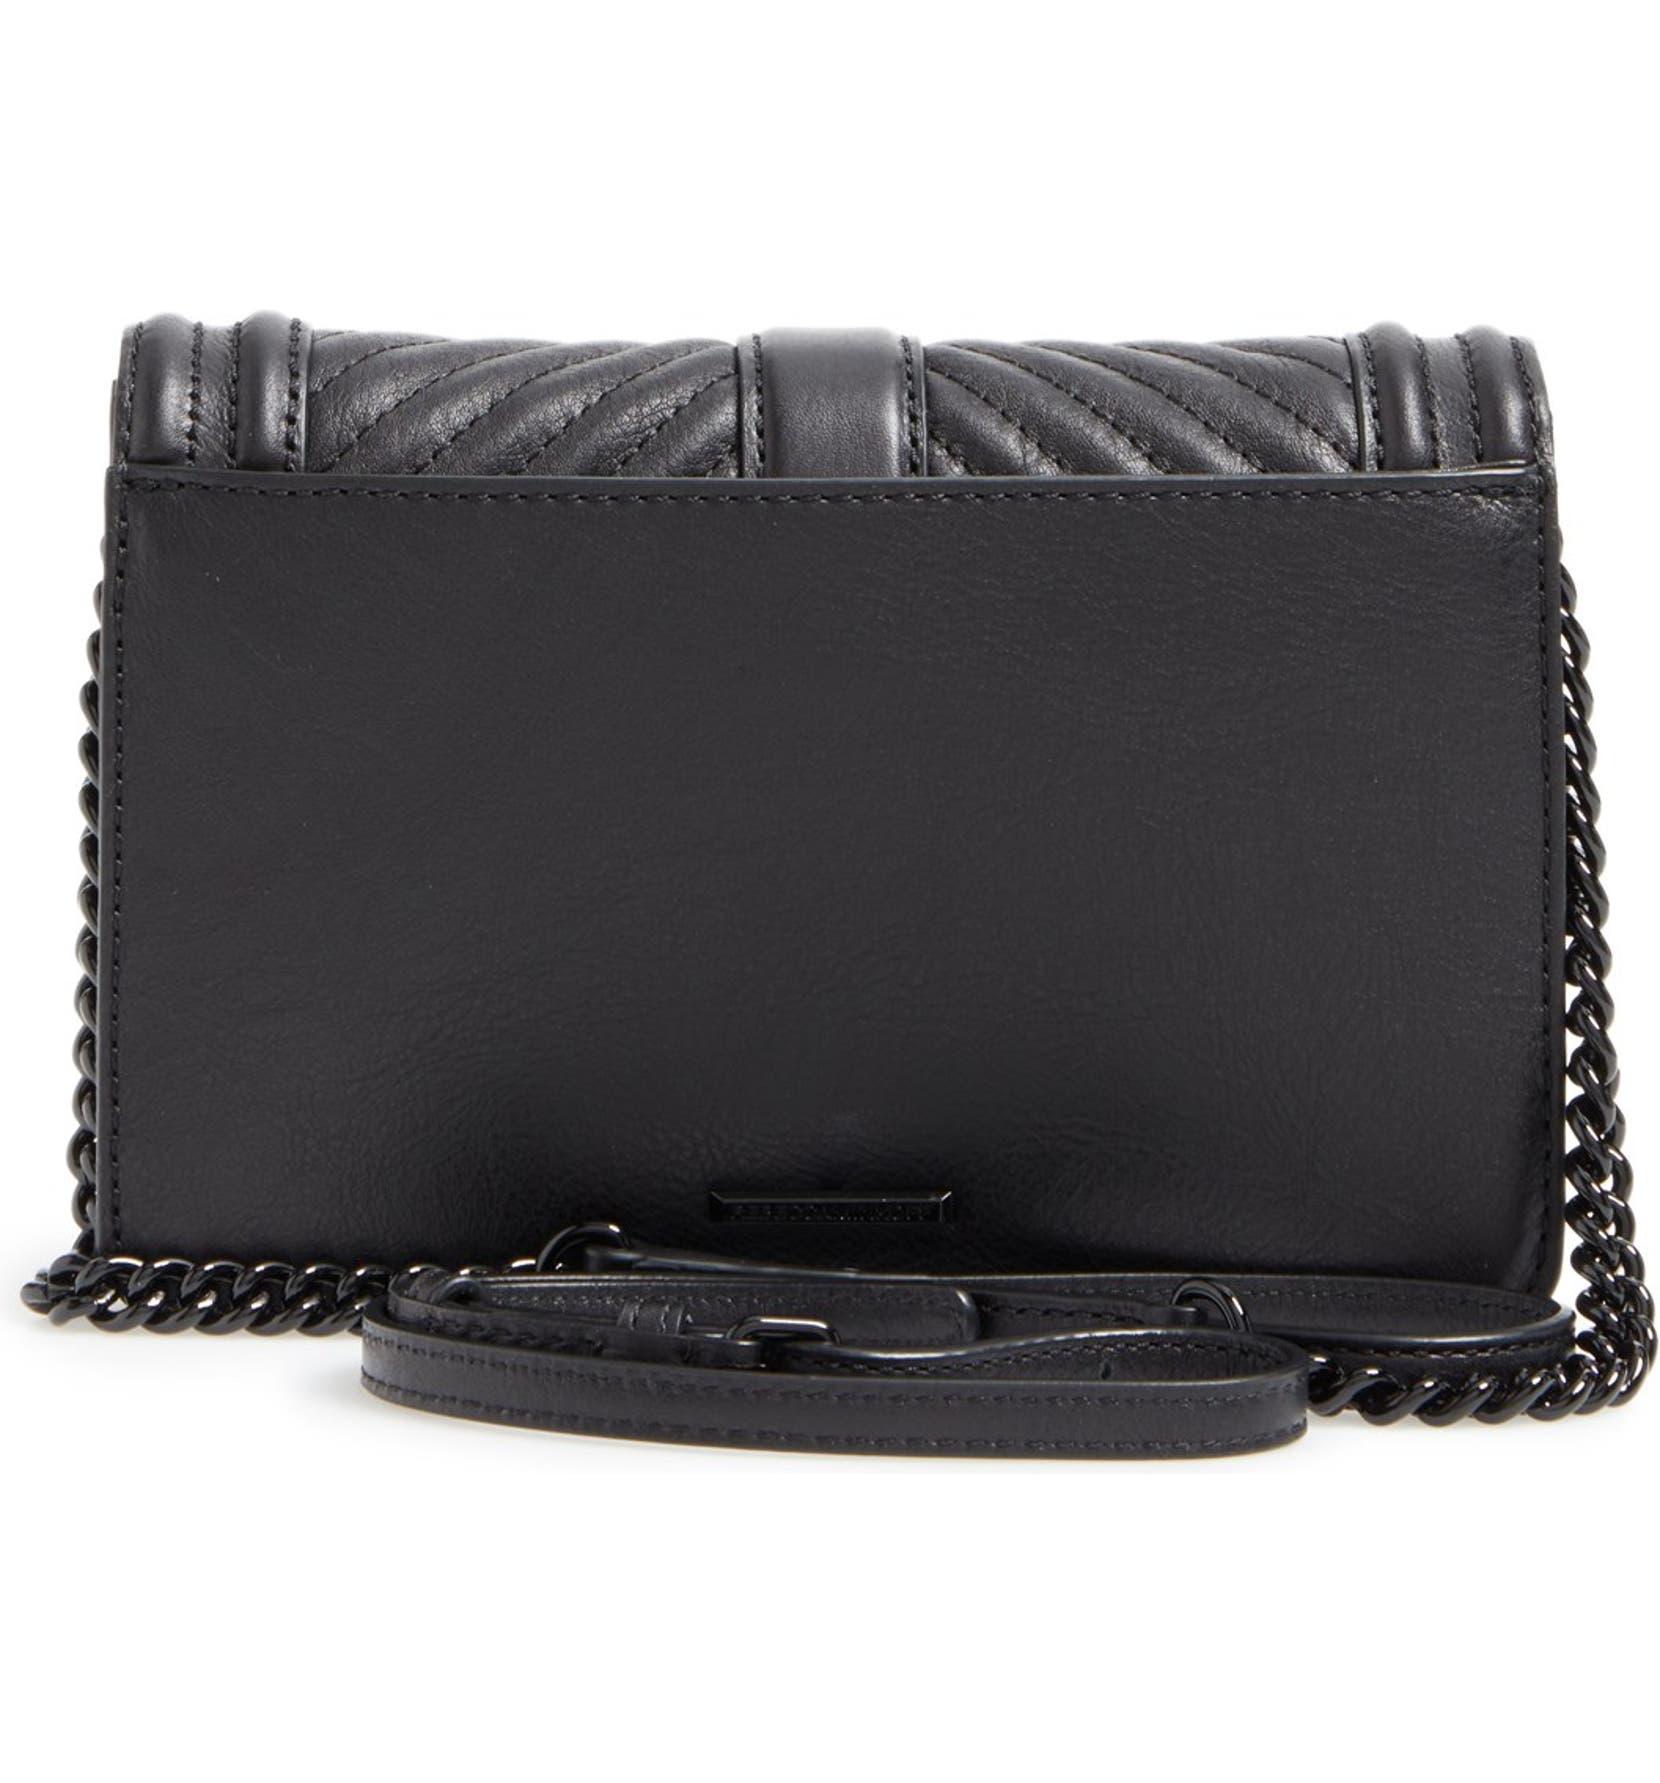 9e191550d9af Rebecca Minkoff Small Love Leather Crossbody Bag